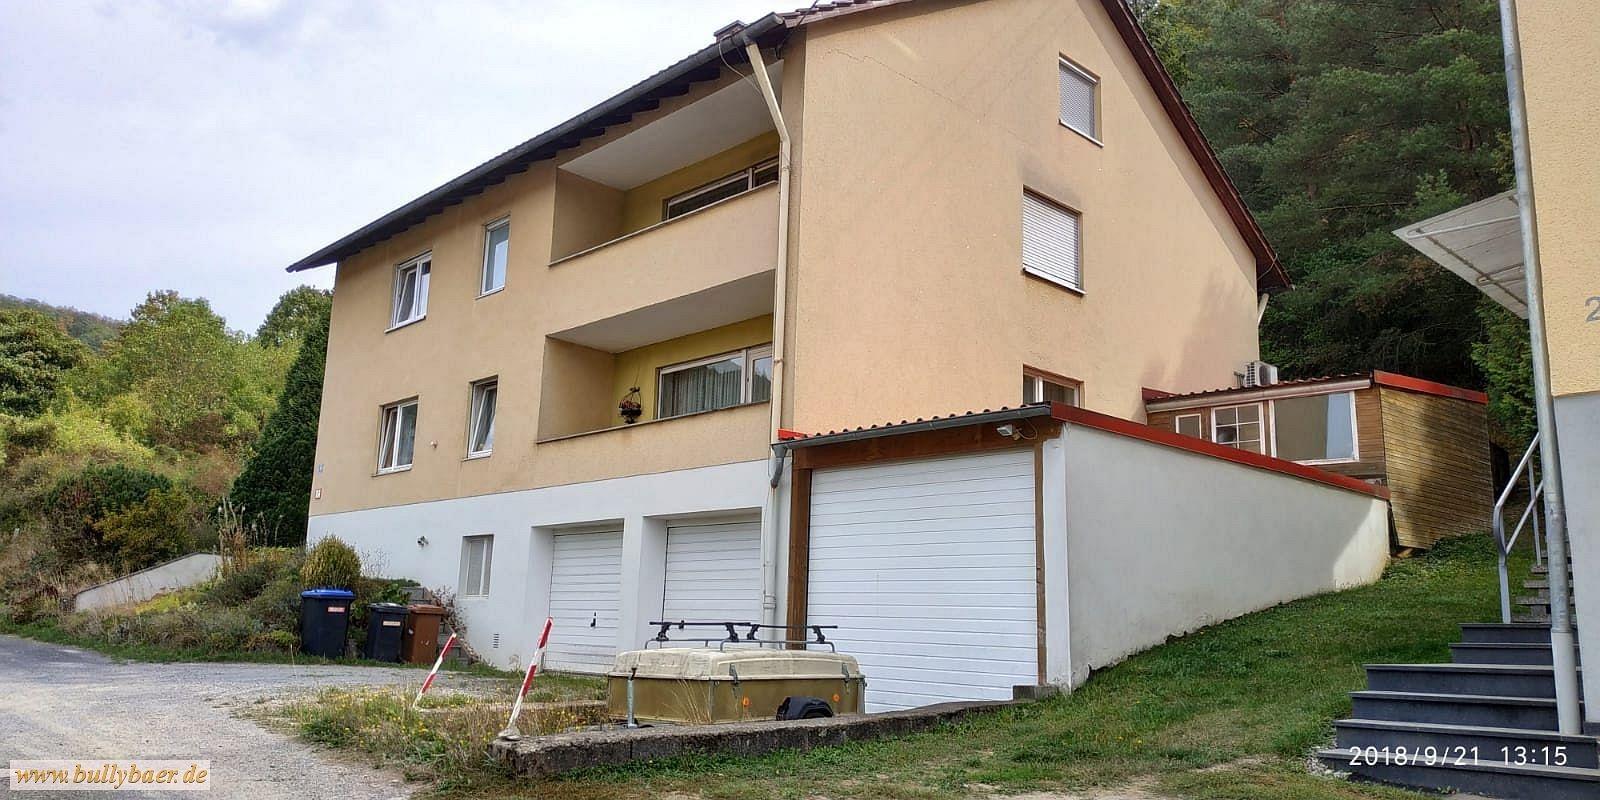 immobilie-zweifamilienwohnhaus-dachgeschoss-einliegerwohnung-zvg-haus-grundstueck-zwangsversteigerung-haeuslekaeufer